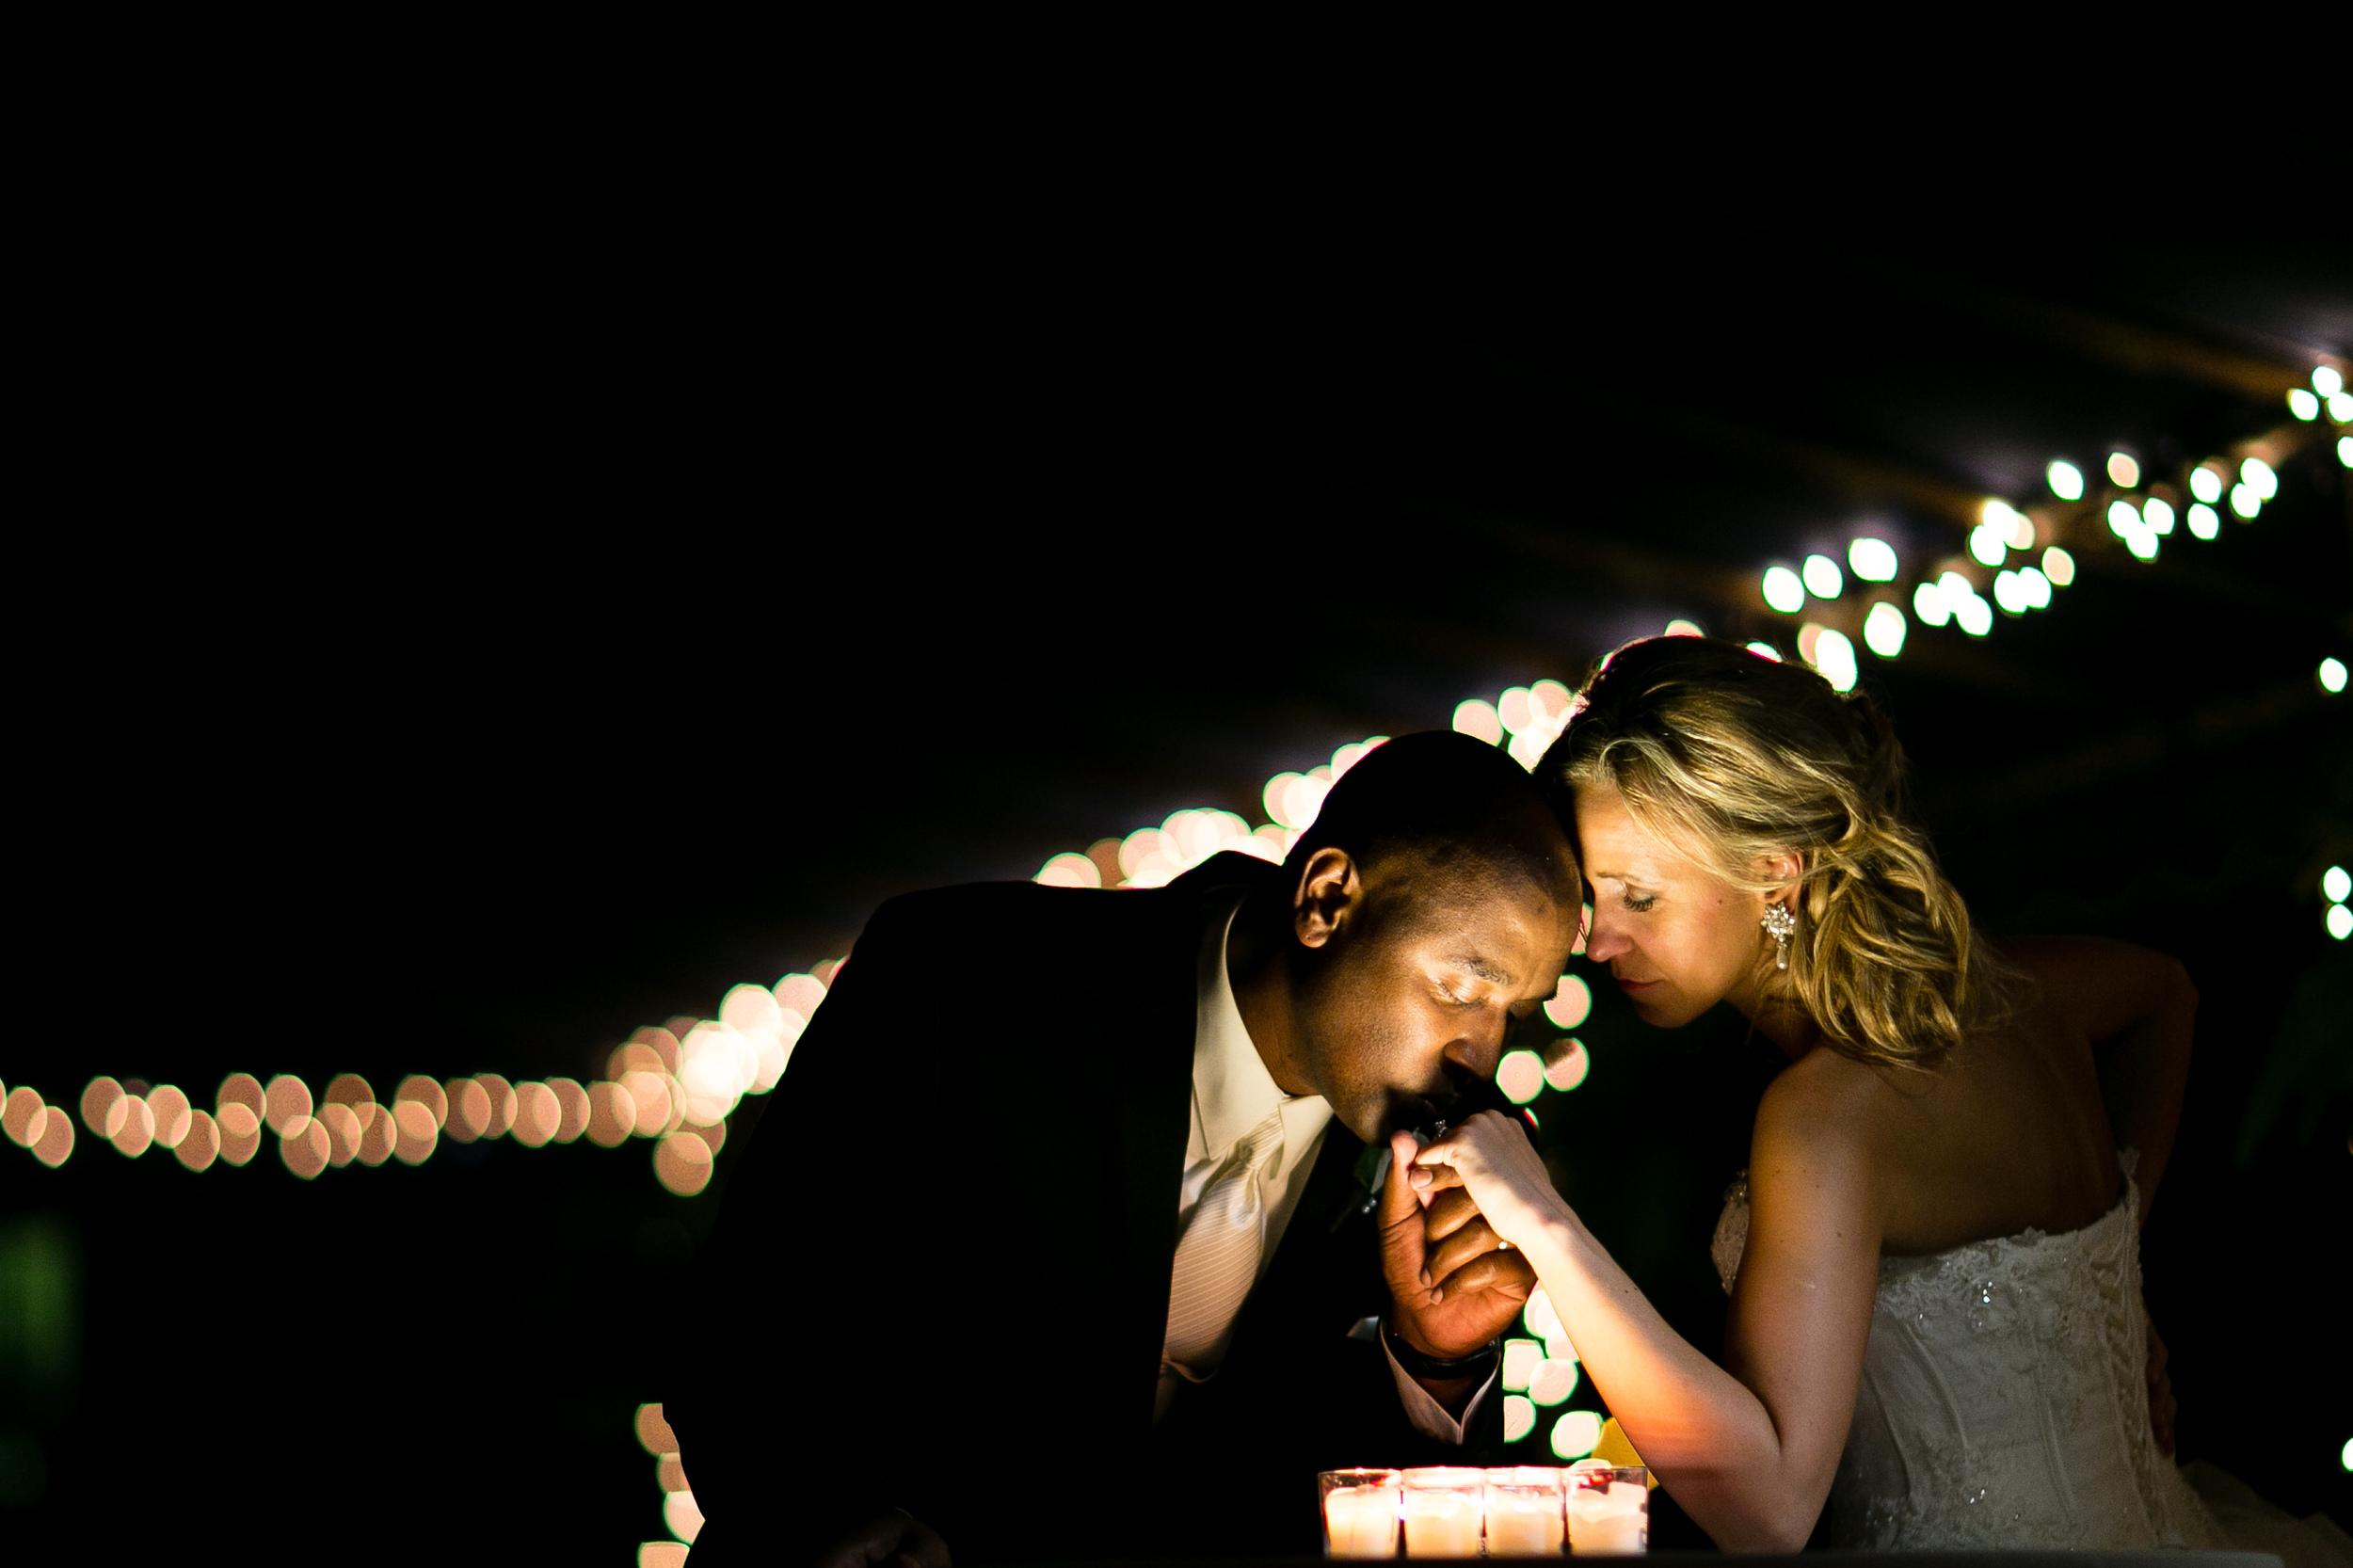 Photo-Journalistic-Wedding-Photography-by-Jacek-Dolata-CT-MA-RI-NJ-NYC-NY-VT-NH-PA-63.jpg